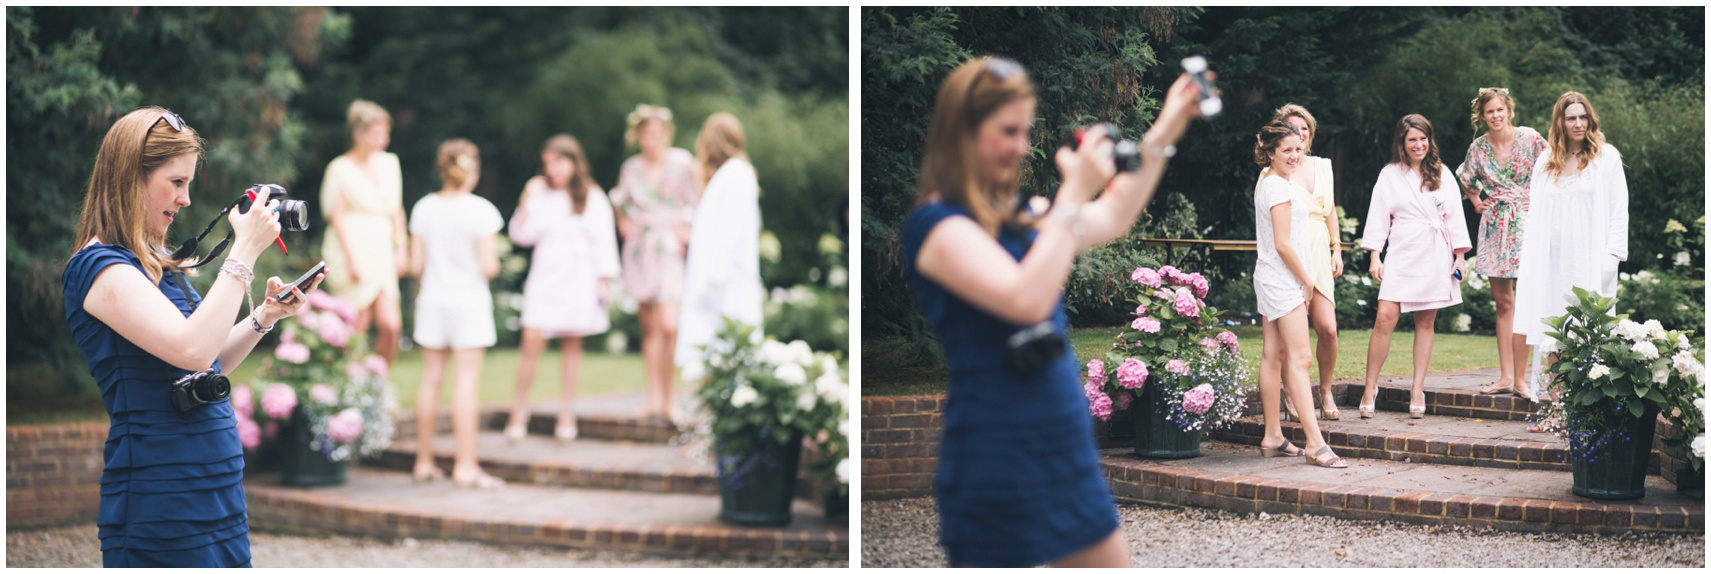 BMC Wedding photography Rutland_0247.jpg